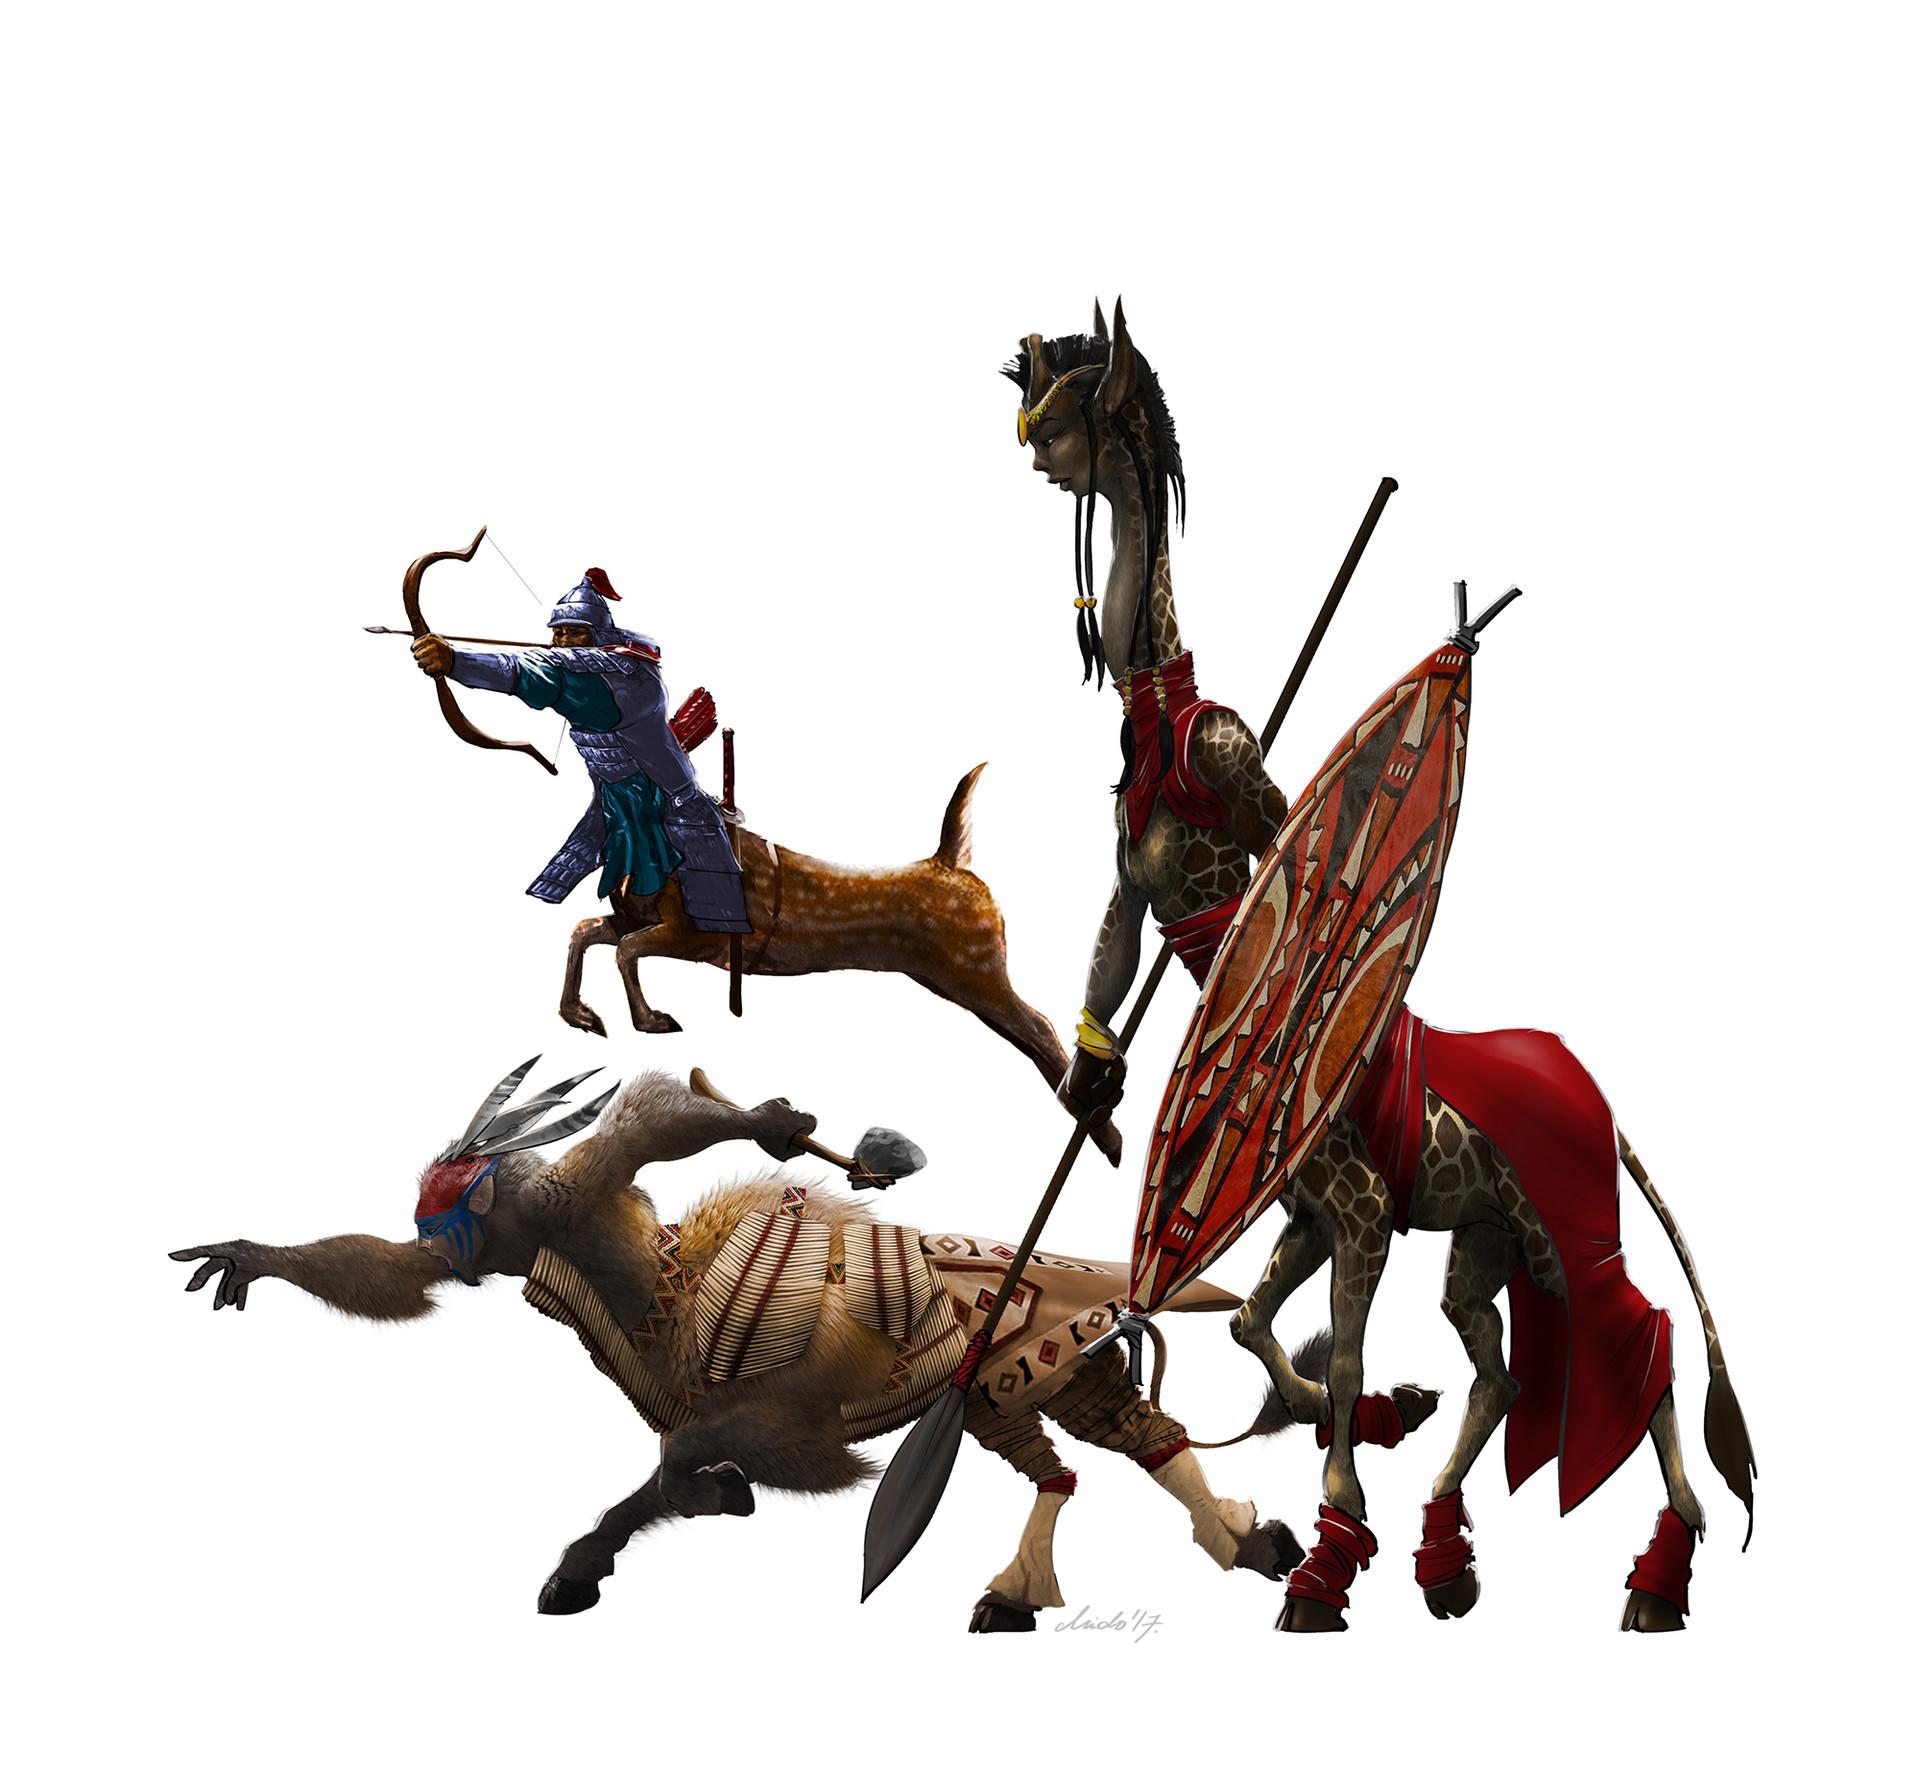 Midhat kapetanovic centaur retroevolution 01